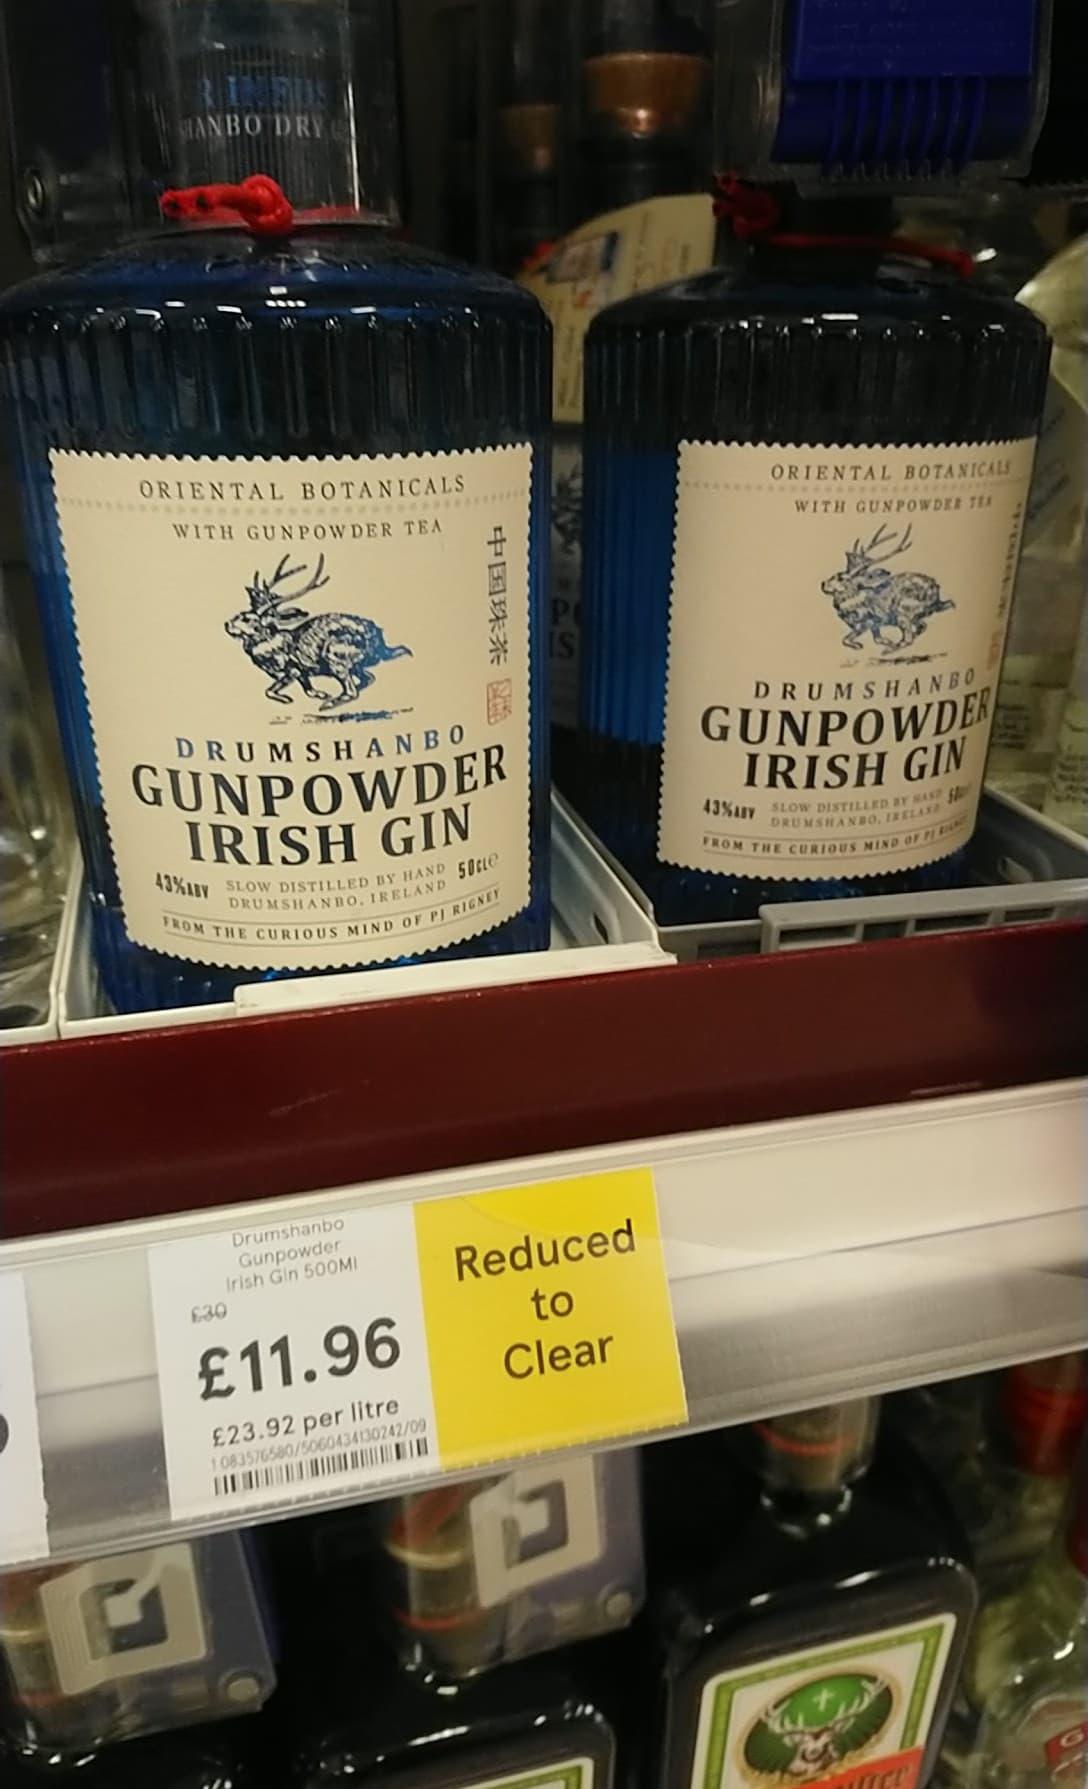 DRUMSHANBO GUNPOWDER  IRISH Gin £11.96 at Tesco in store. Uddingston, Glasgow.